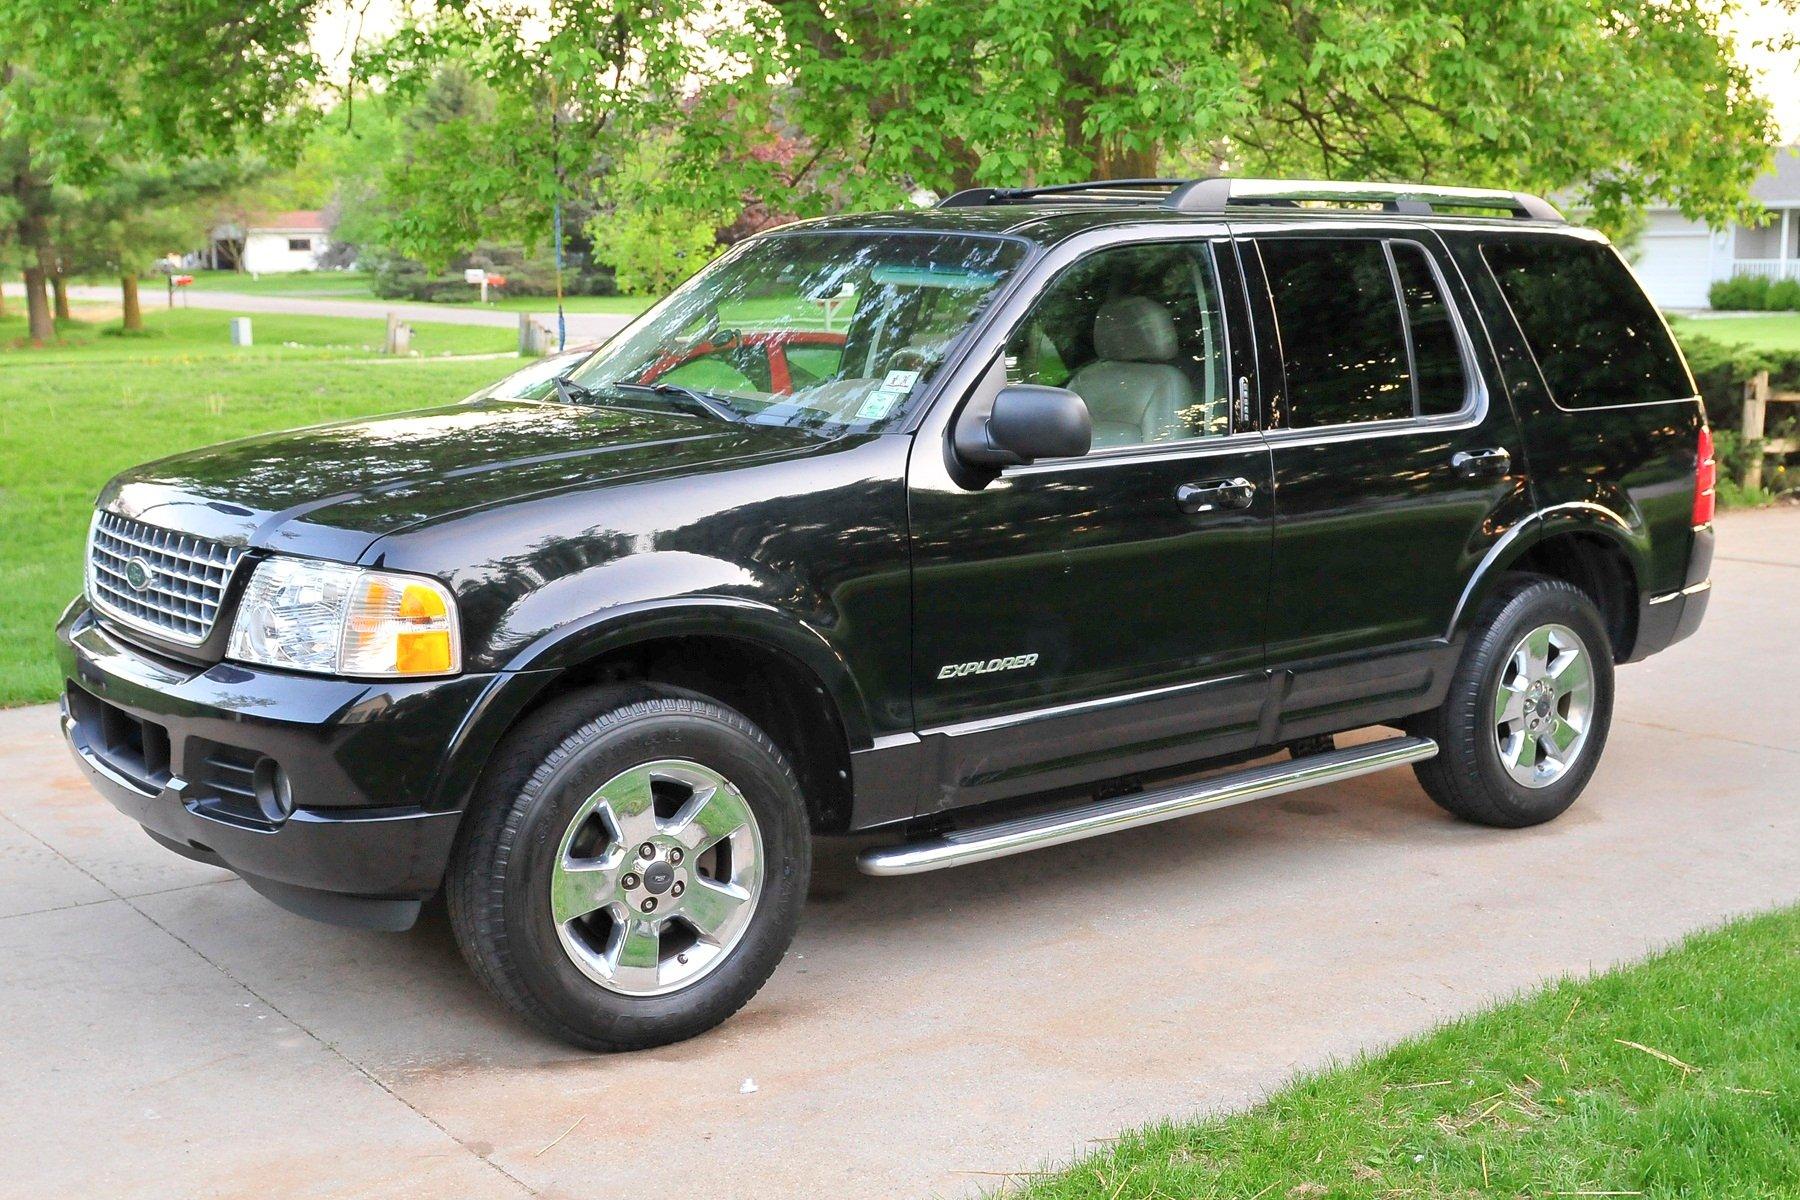 Black Ford Explorer, License Plate BCQ 4820